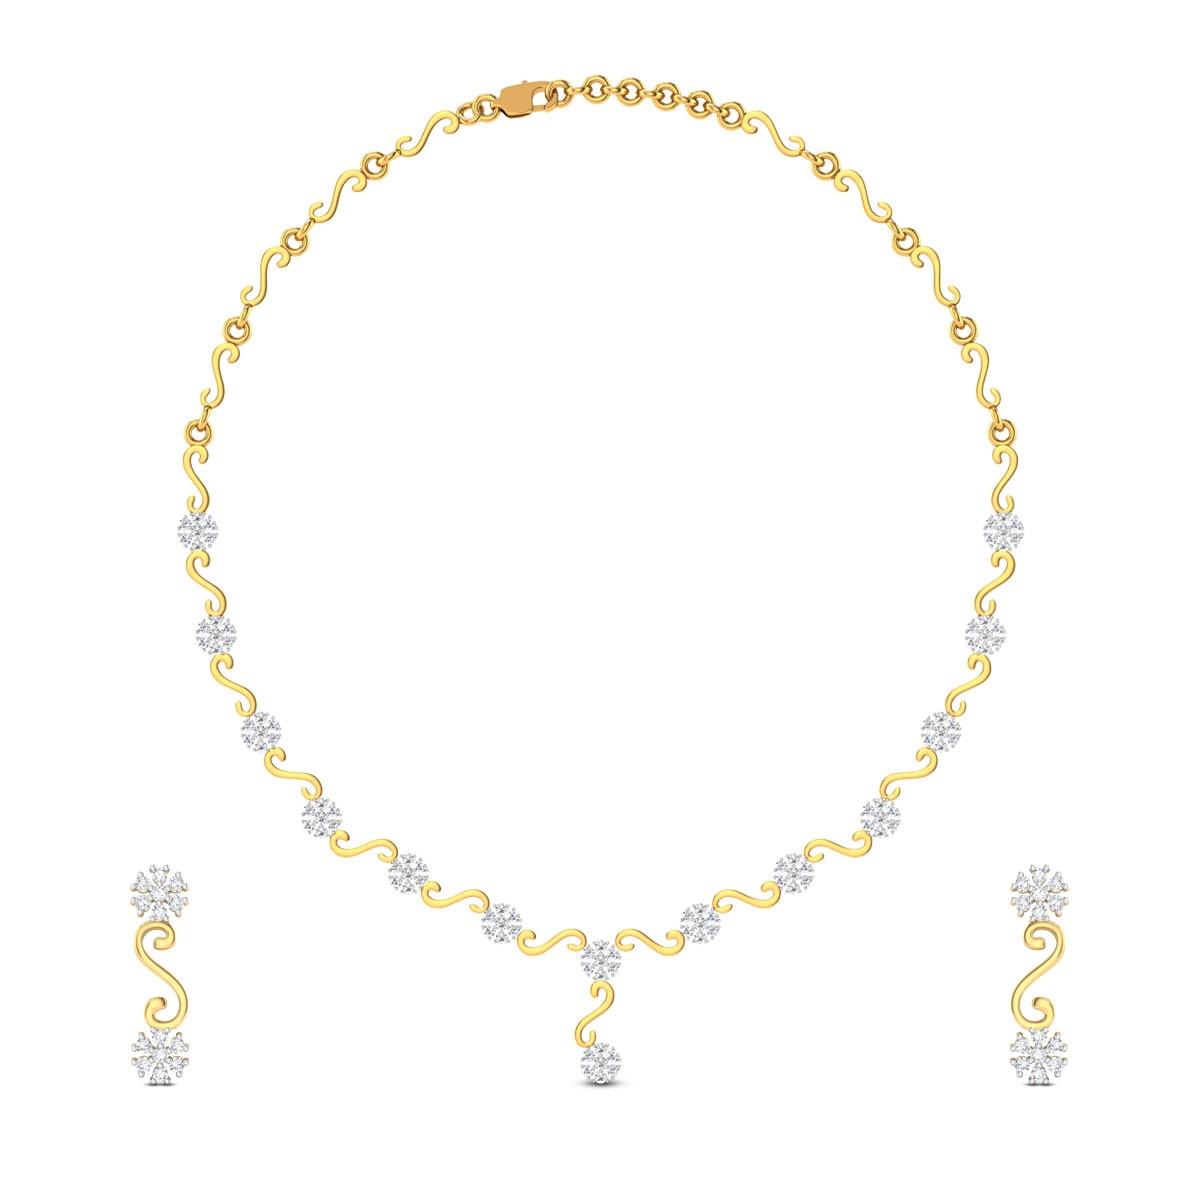 Mahalath Diamond Floral Necklace